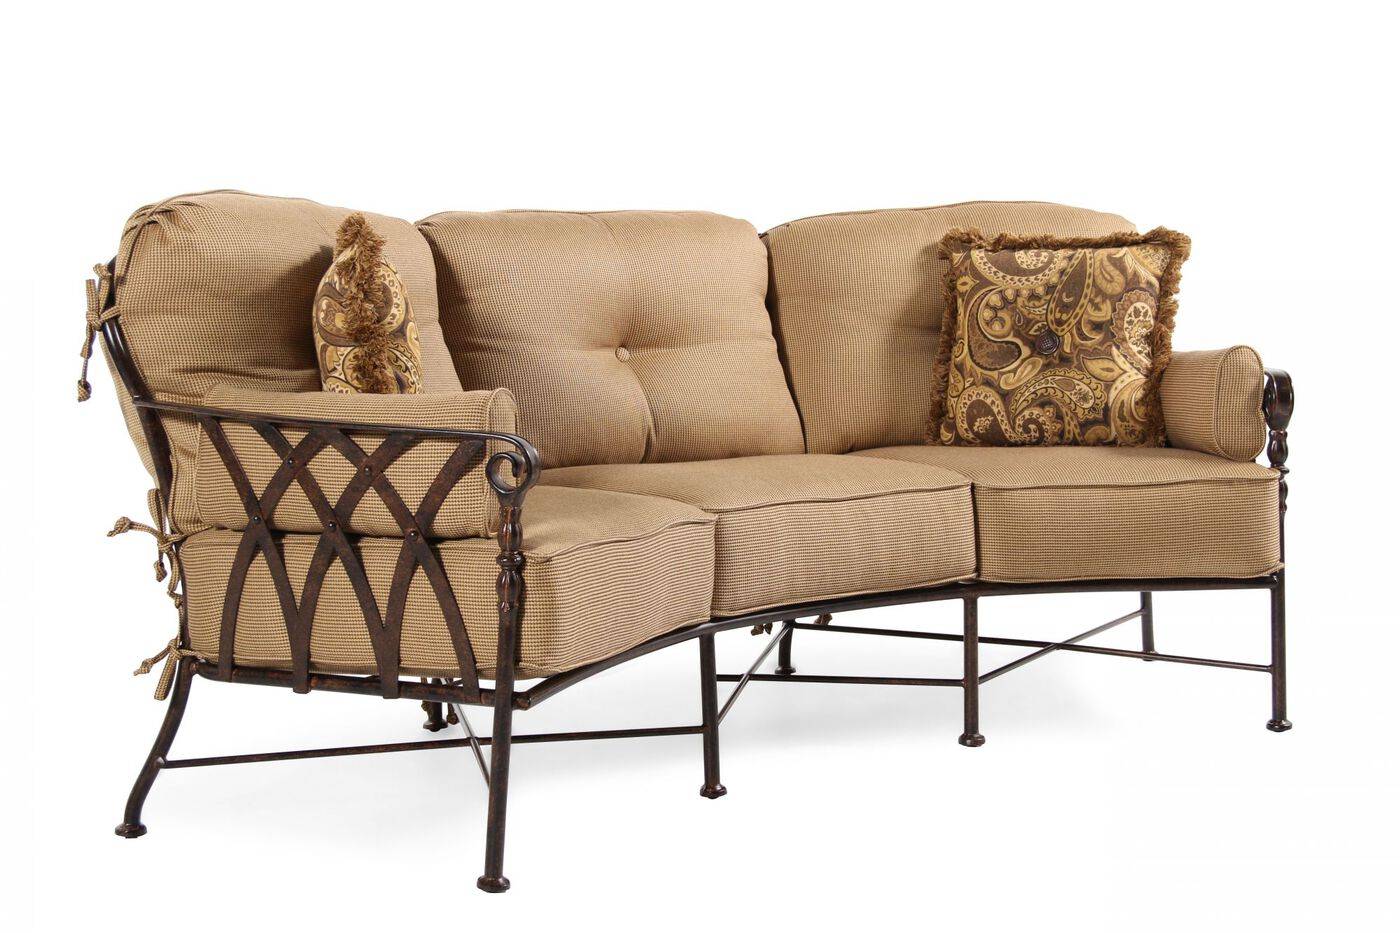 Excellent Aluminum Crescent Sofa in Tan | Mathis Brothers Furniture ZG11